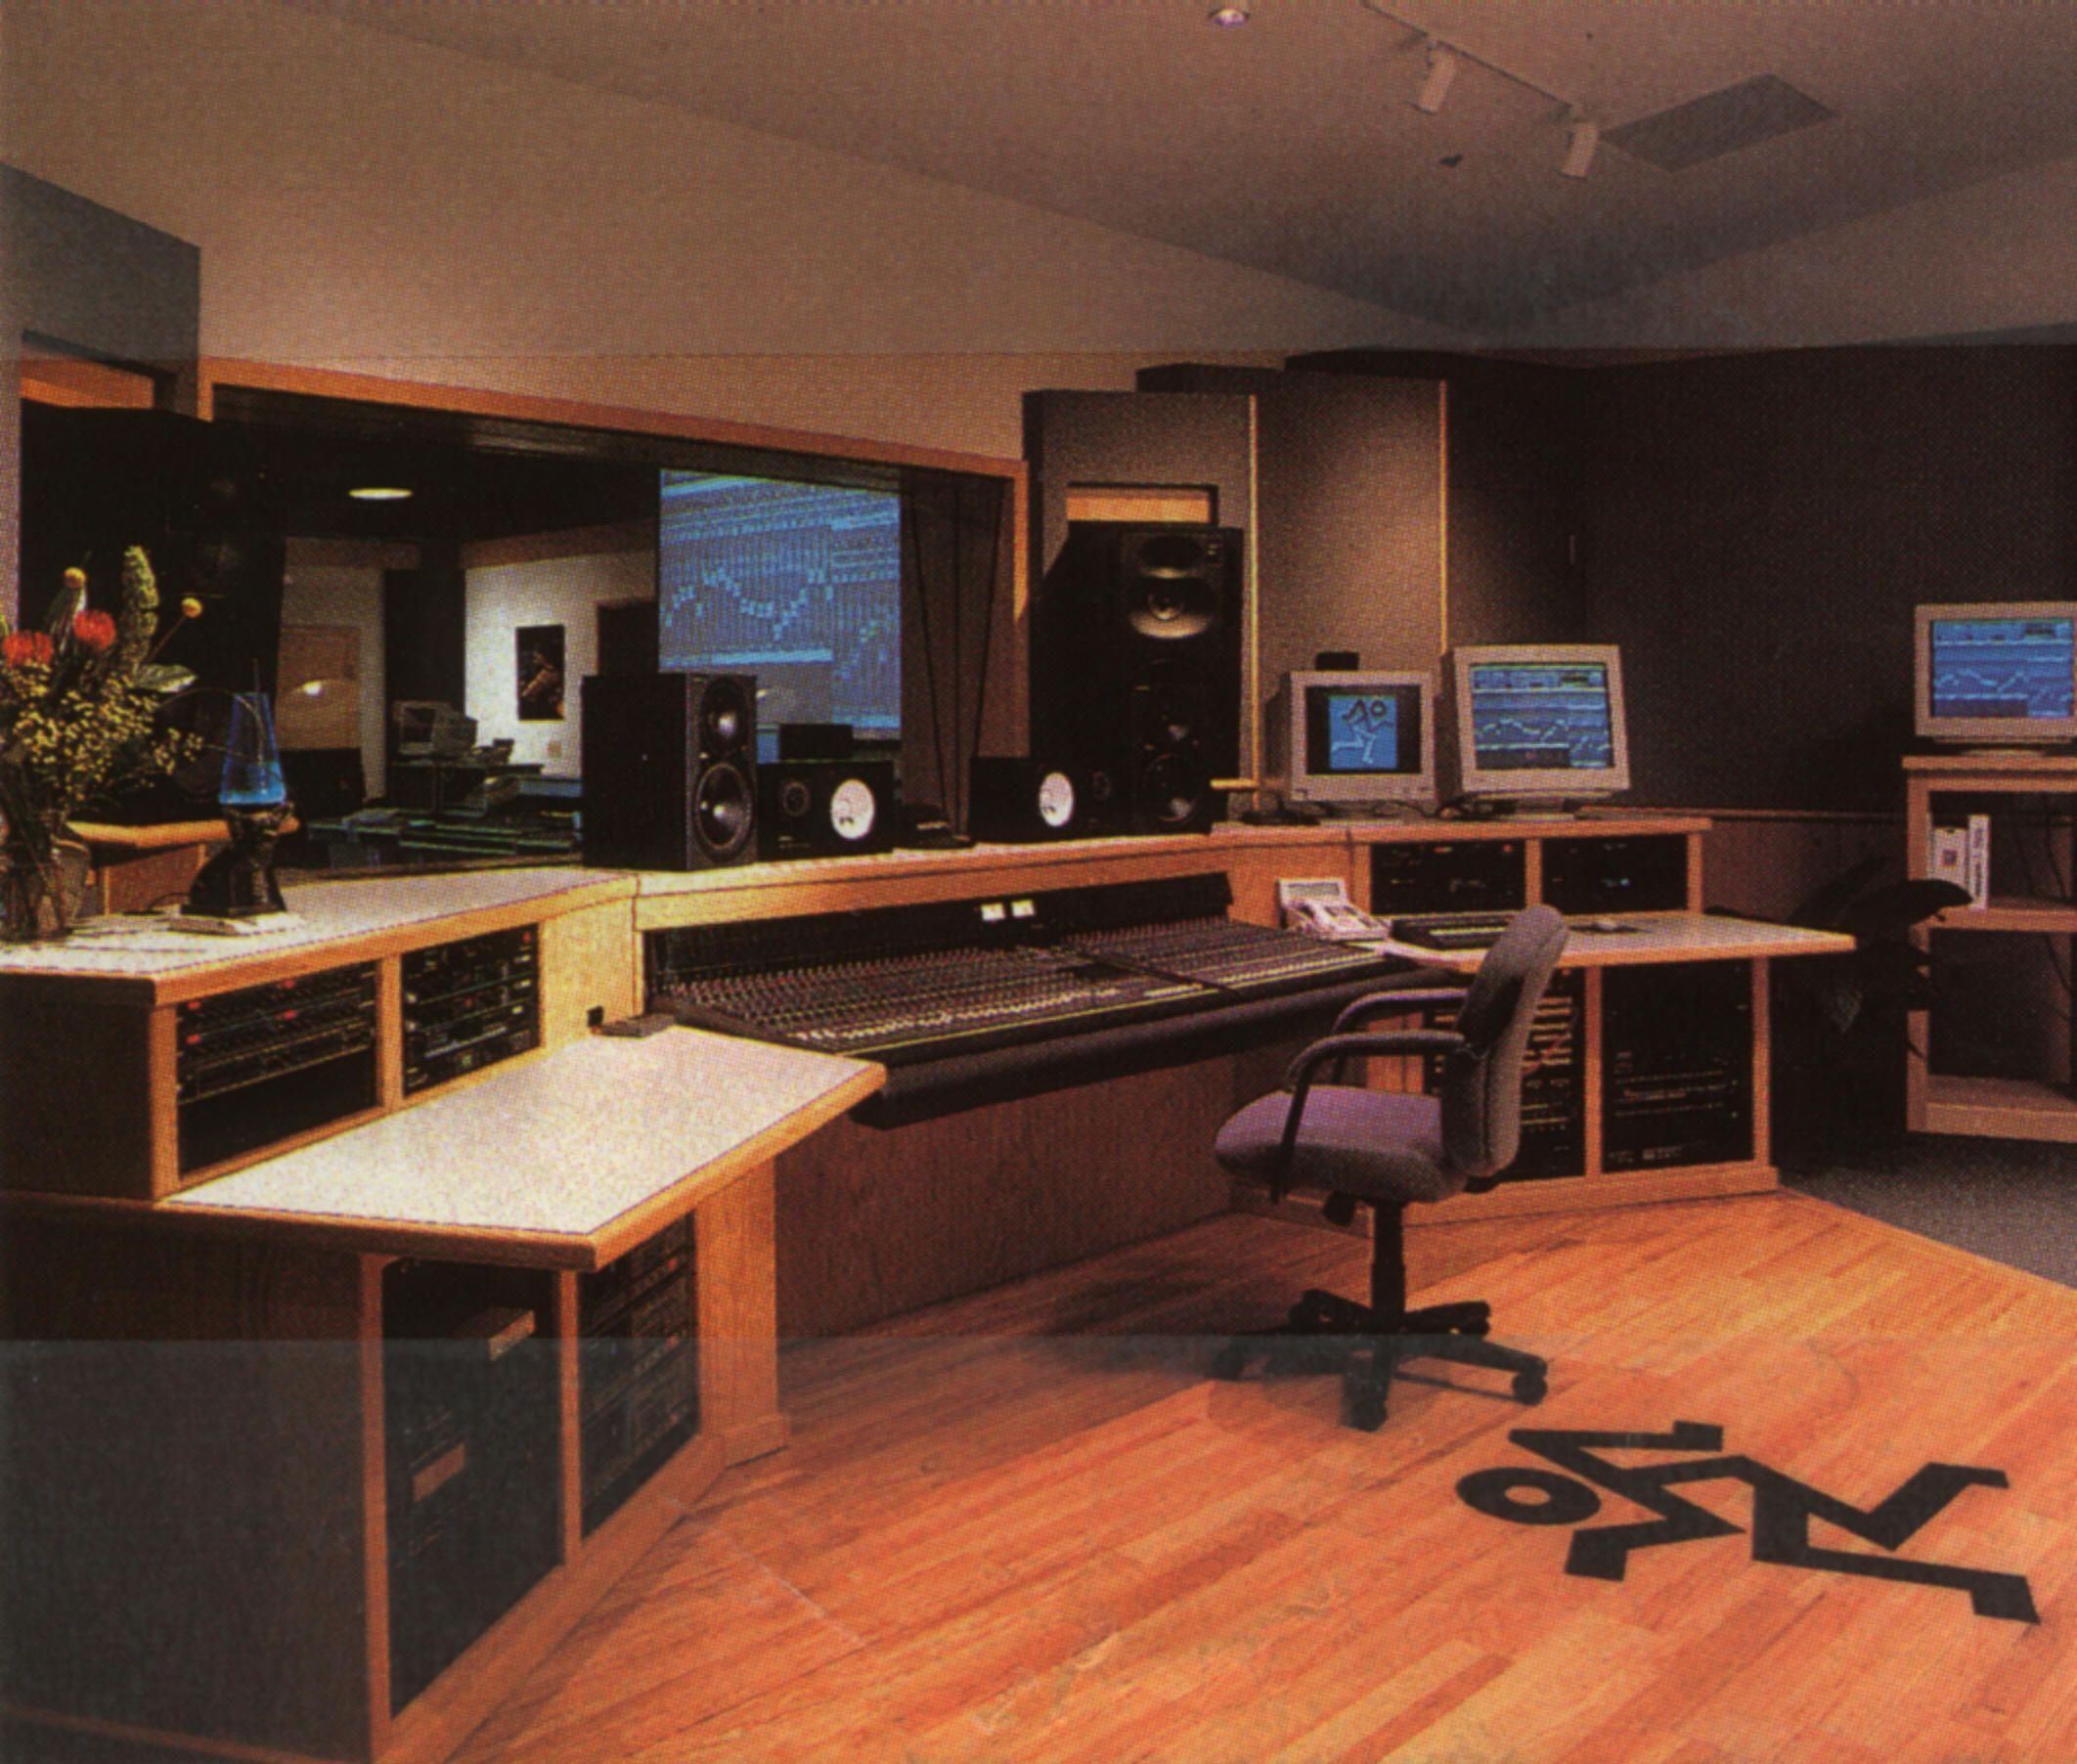 Best Kitchen Gallery: Homerecorder Index Php Ad Pinterest Cool Recording of Home Studio Design Ideas  on rachelxblog.com